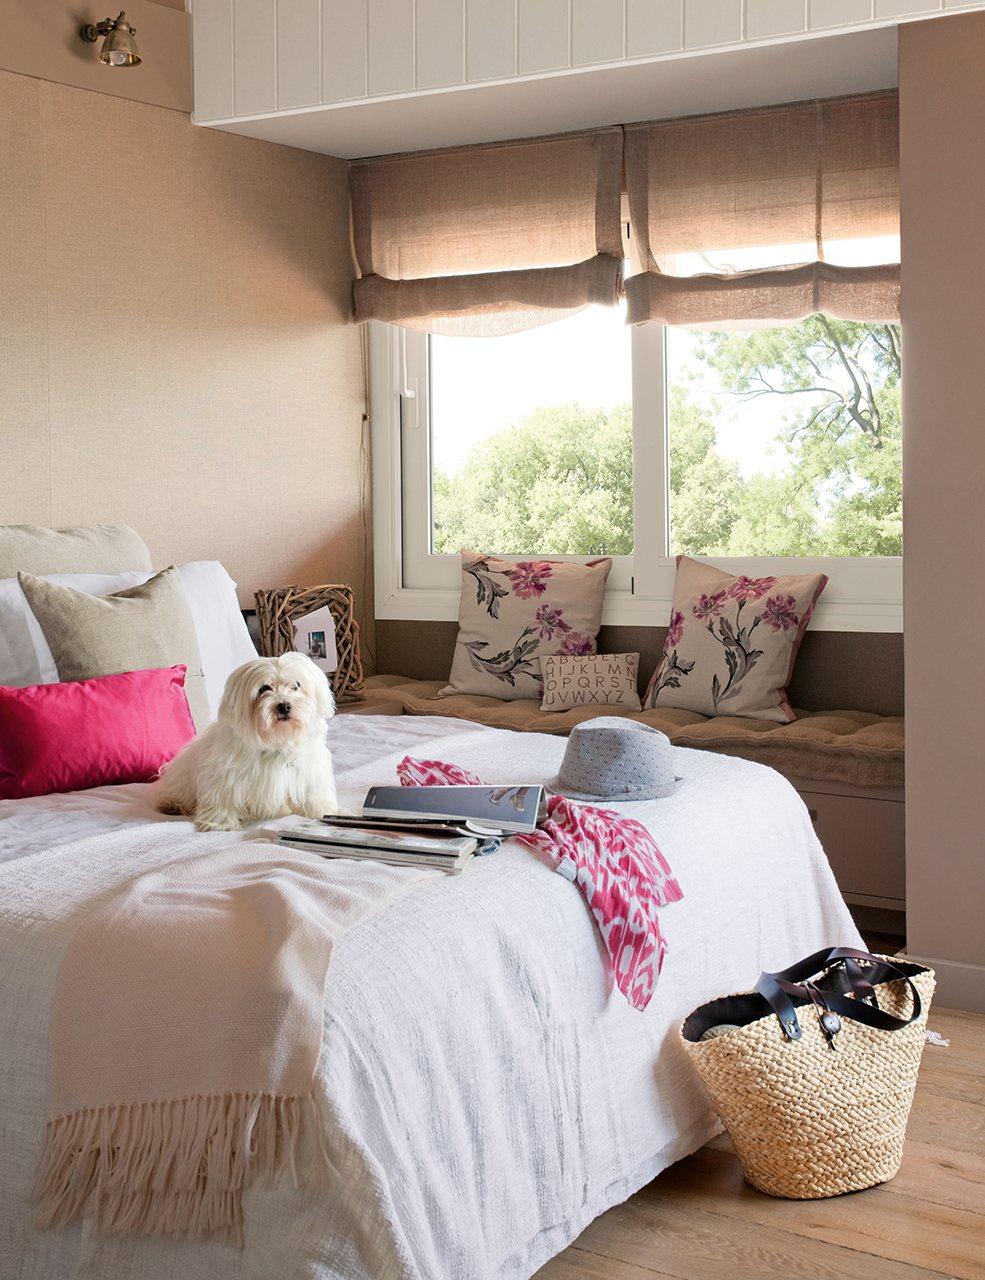 Dormitorios peque os bonitos con grandes ideas - Modelos de dormitorios juveniles ...